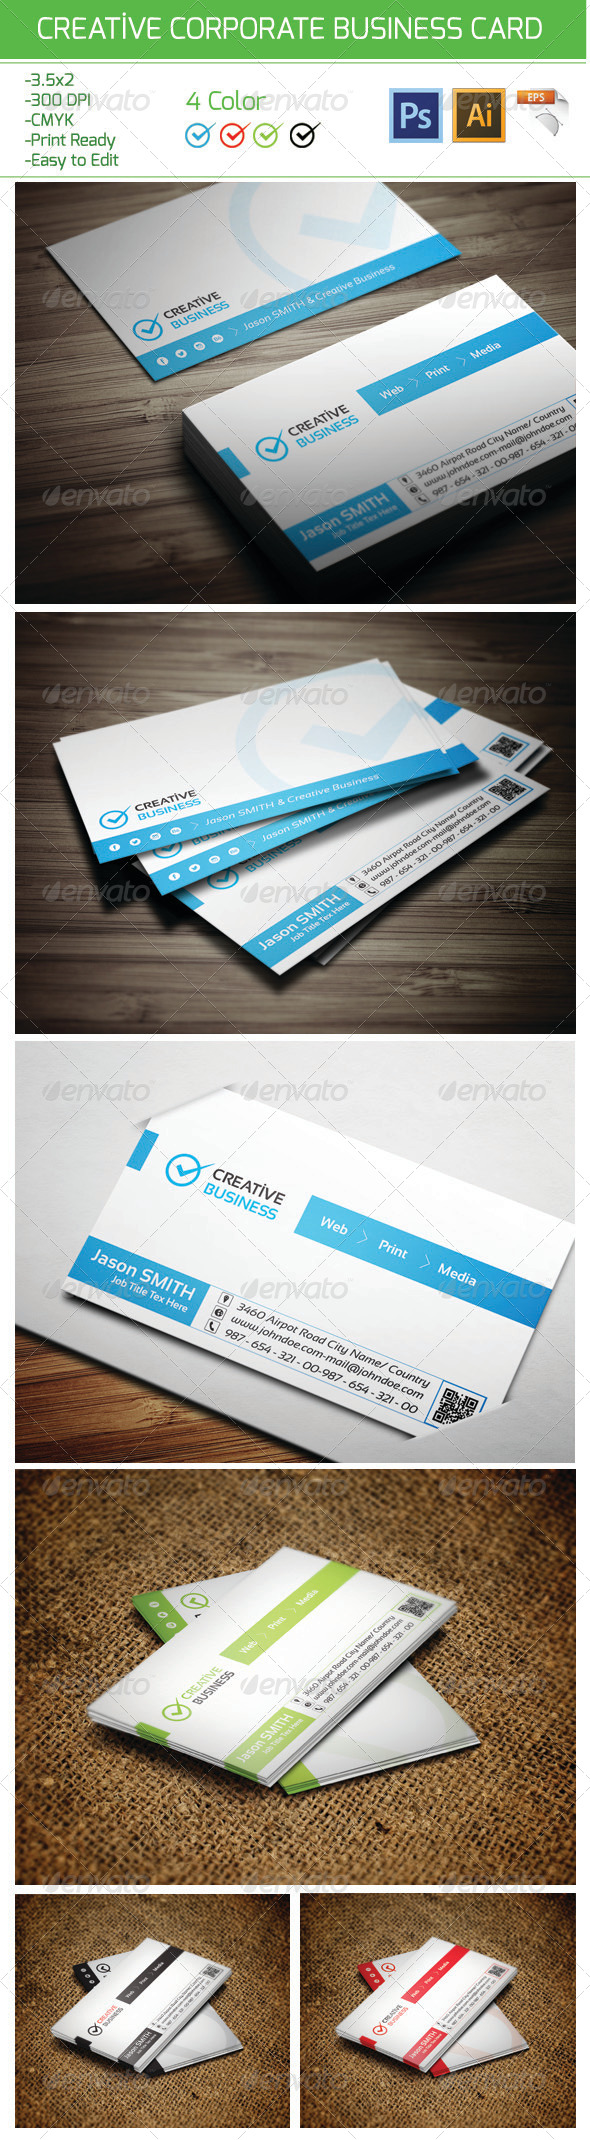 Creative Corporate Business Card 17 - Corporate Business Cards